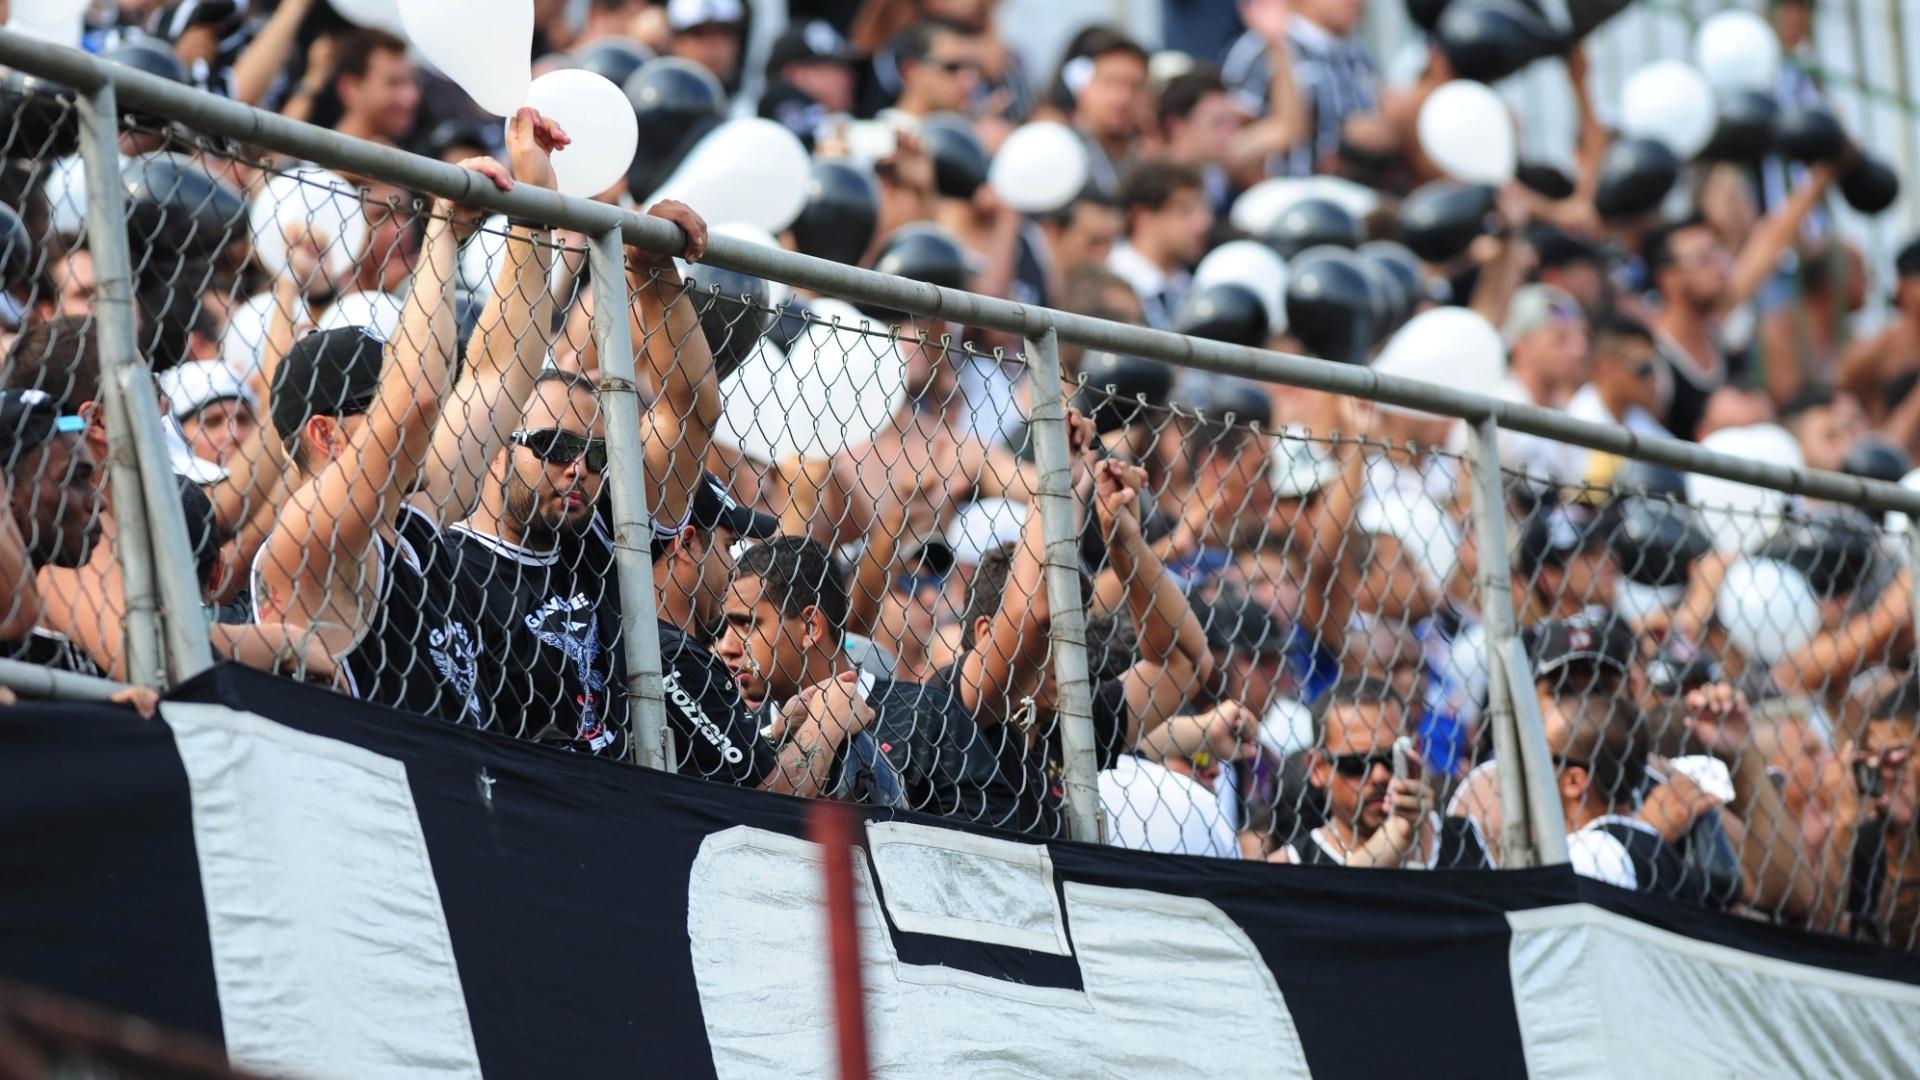 19.jan.2014 - Torcida do Corinthians marca presença na partida contra a Portuguesa no Canindé